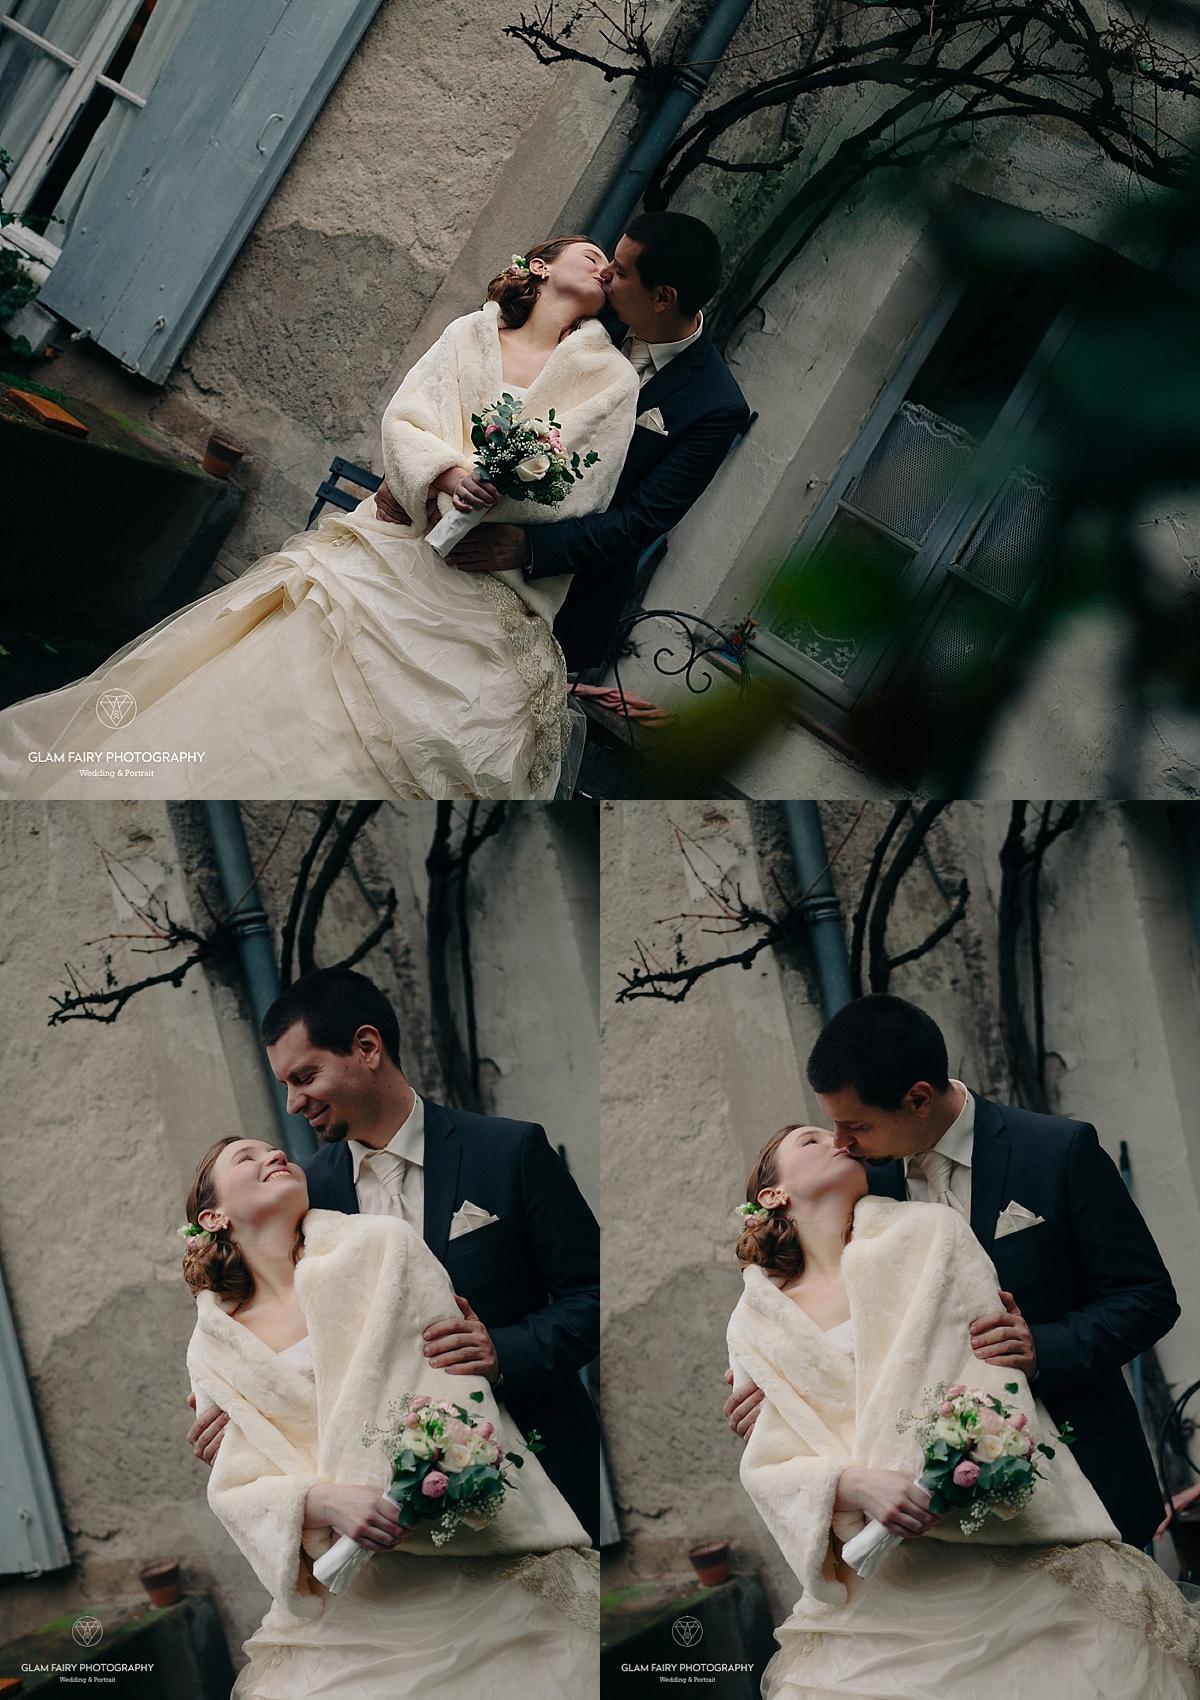 GlamFairyPhotography-mariage-hiver-pressigny-les-pins-aryz_0022